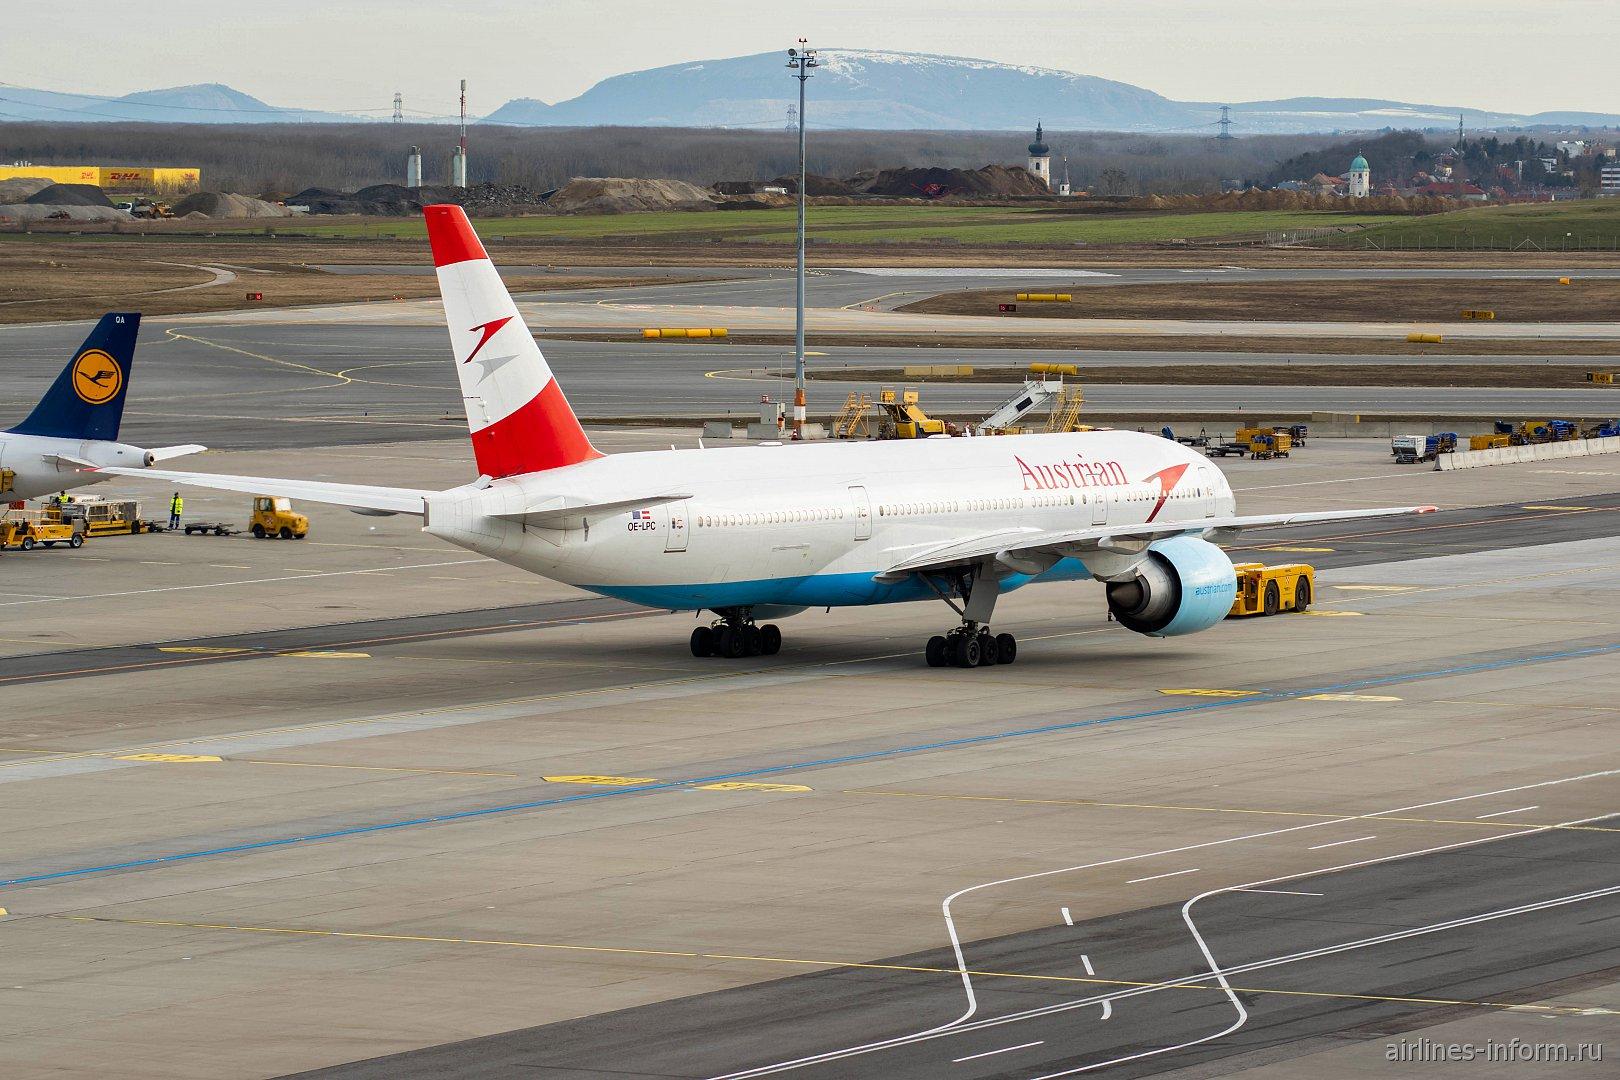 Буксировка самолета Боинг-777-200 Австрийских авиалиний (рег. номер OE-LPC) в аэропорту Вены